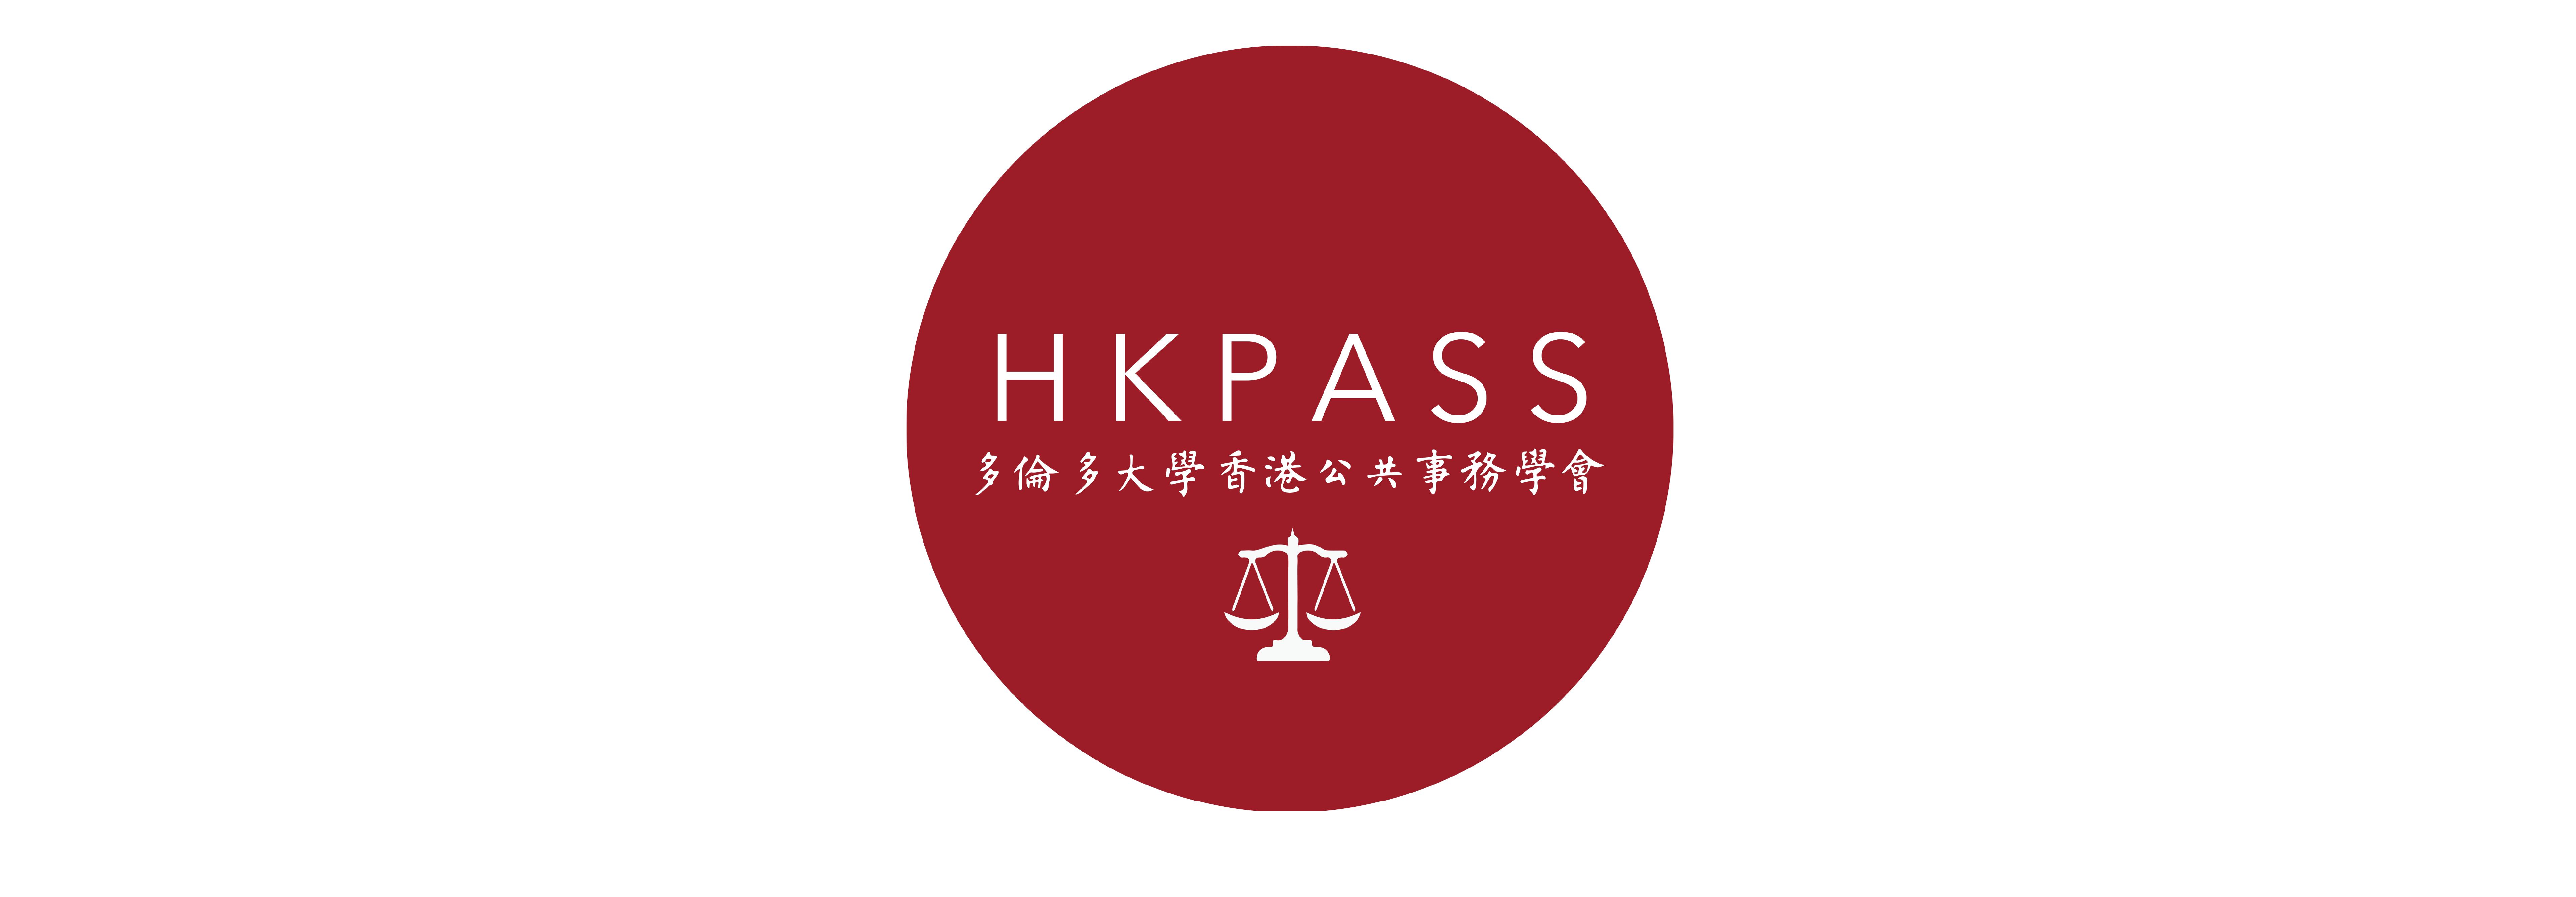 University of Toronto Hong Kong Public Affairs & Social Service Society